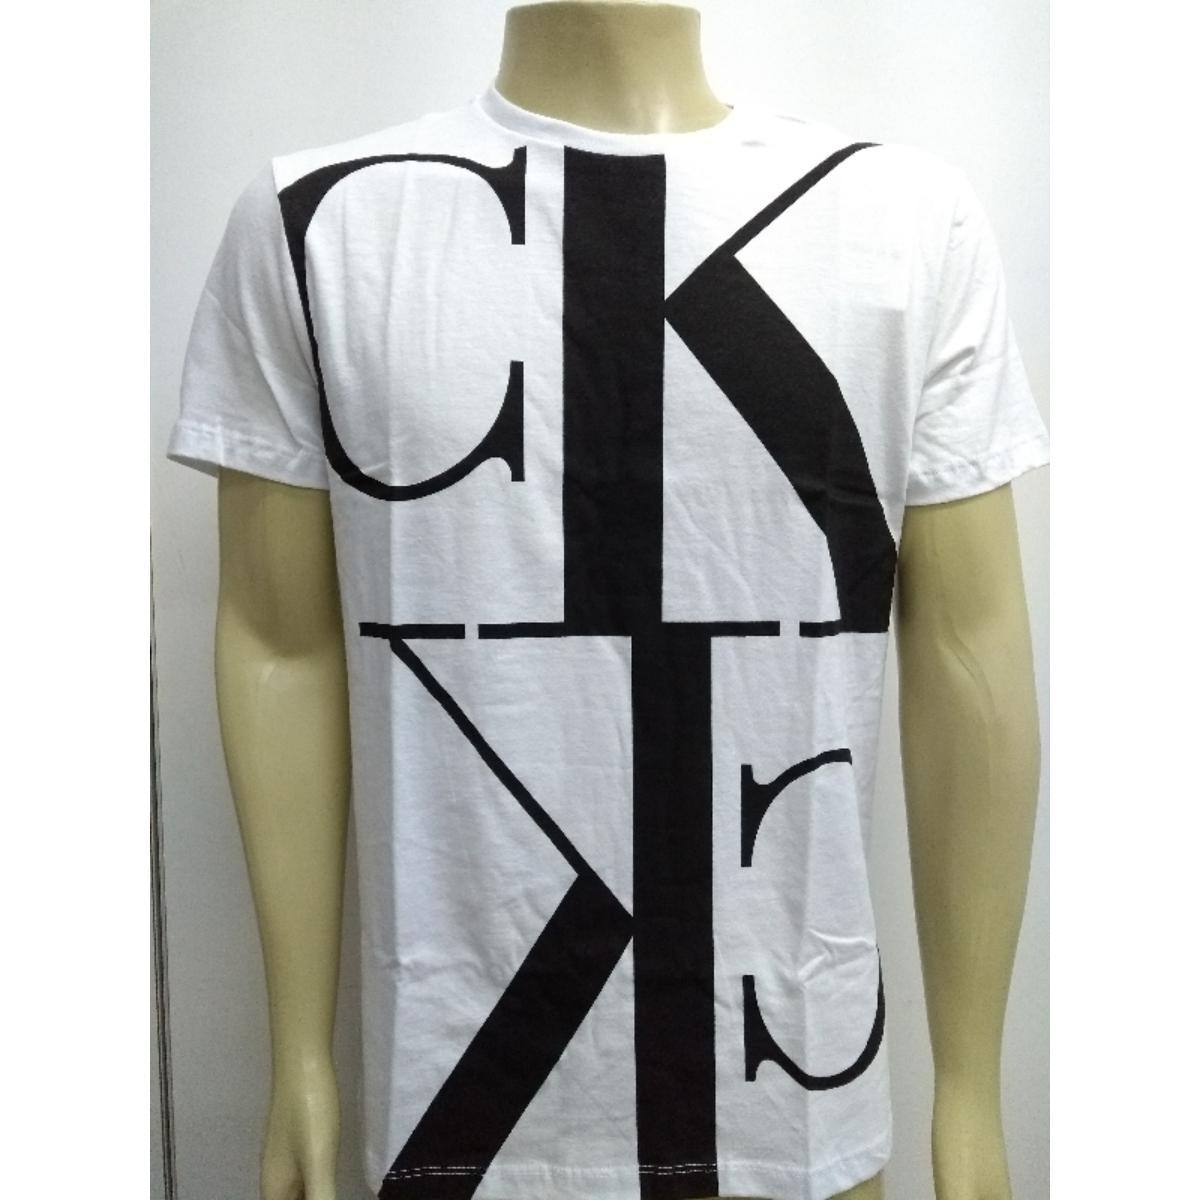 Camiseta Masculina Calvin Klein Cm0oc01tc855 Branco